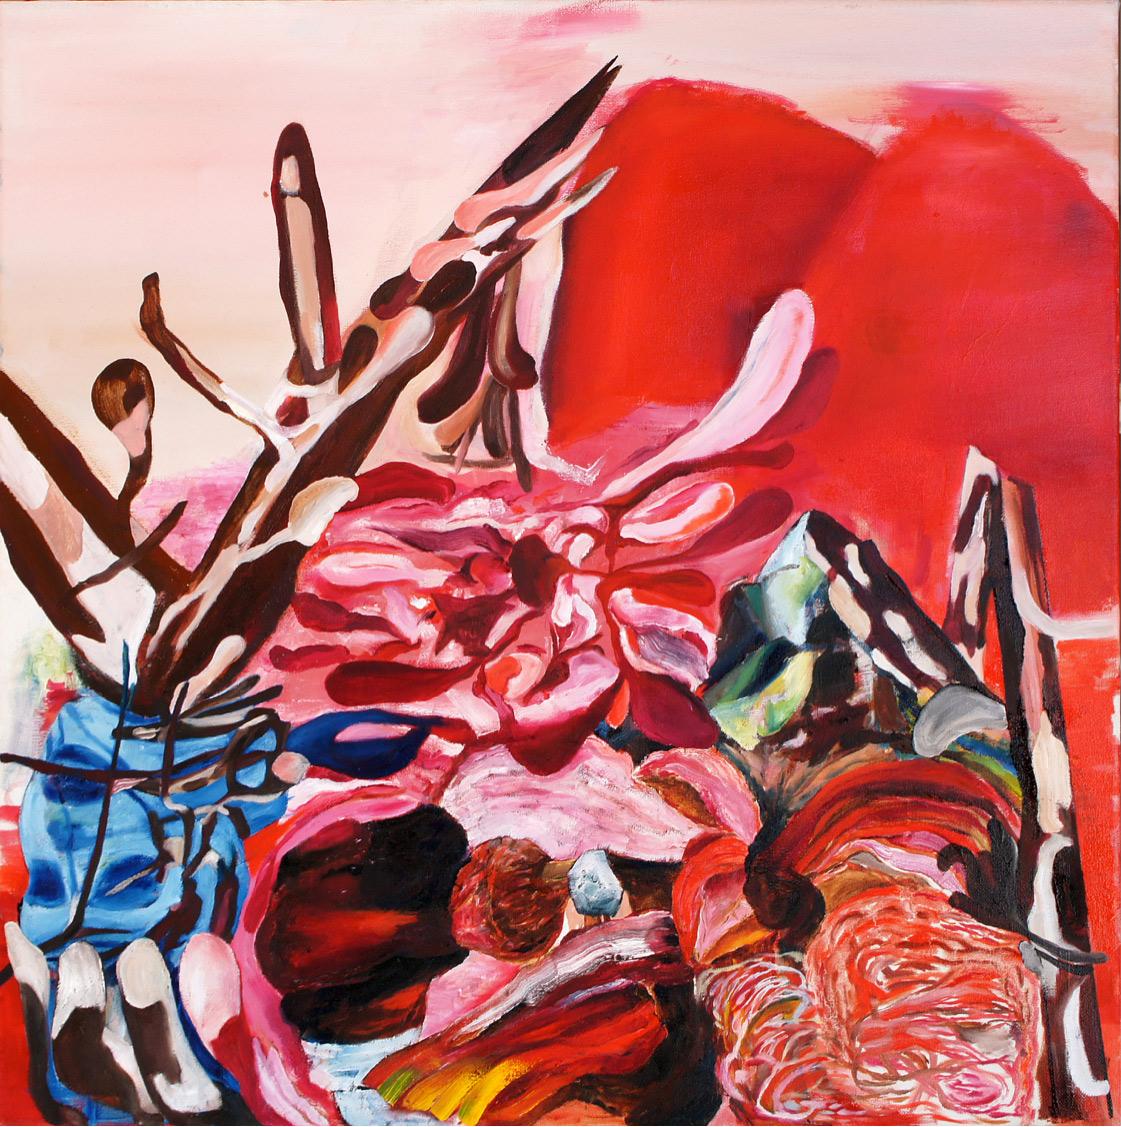 George Kazazis, Lacrimosa, Oil on canvas, 60x60 cm, 2018